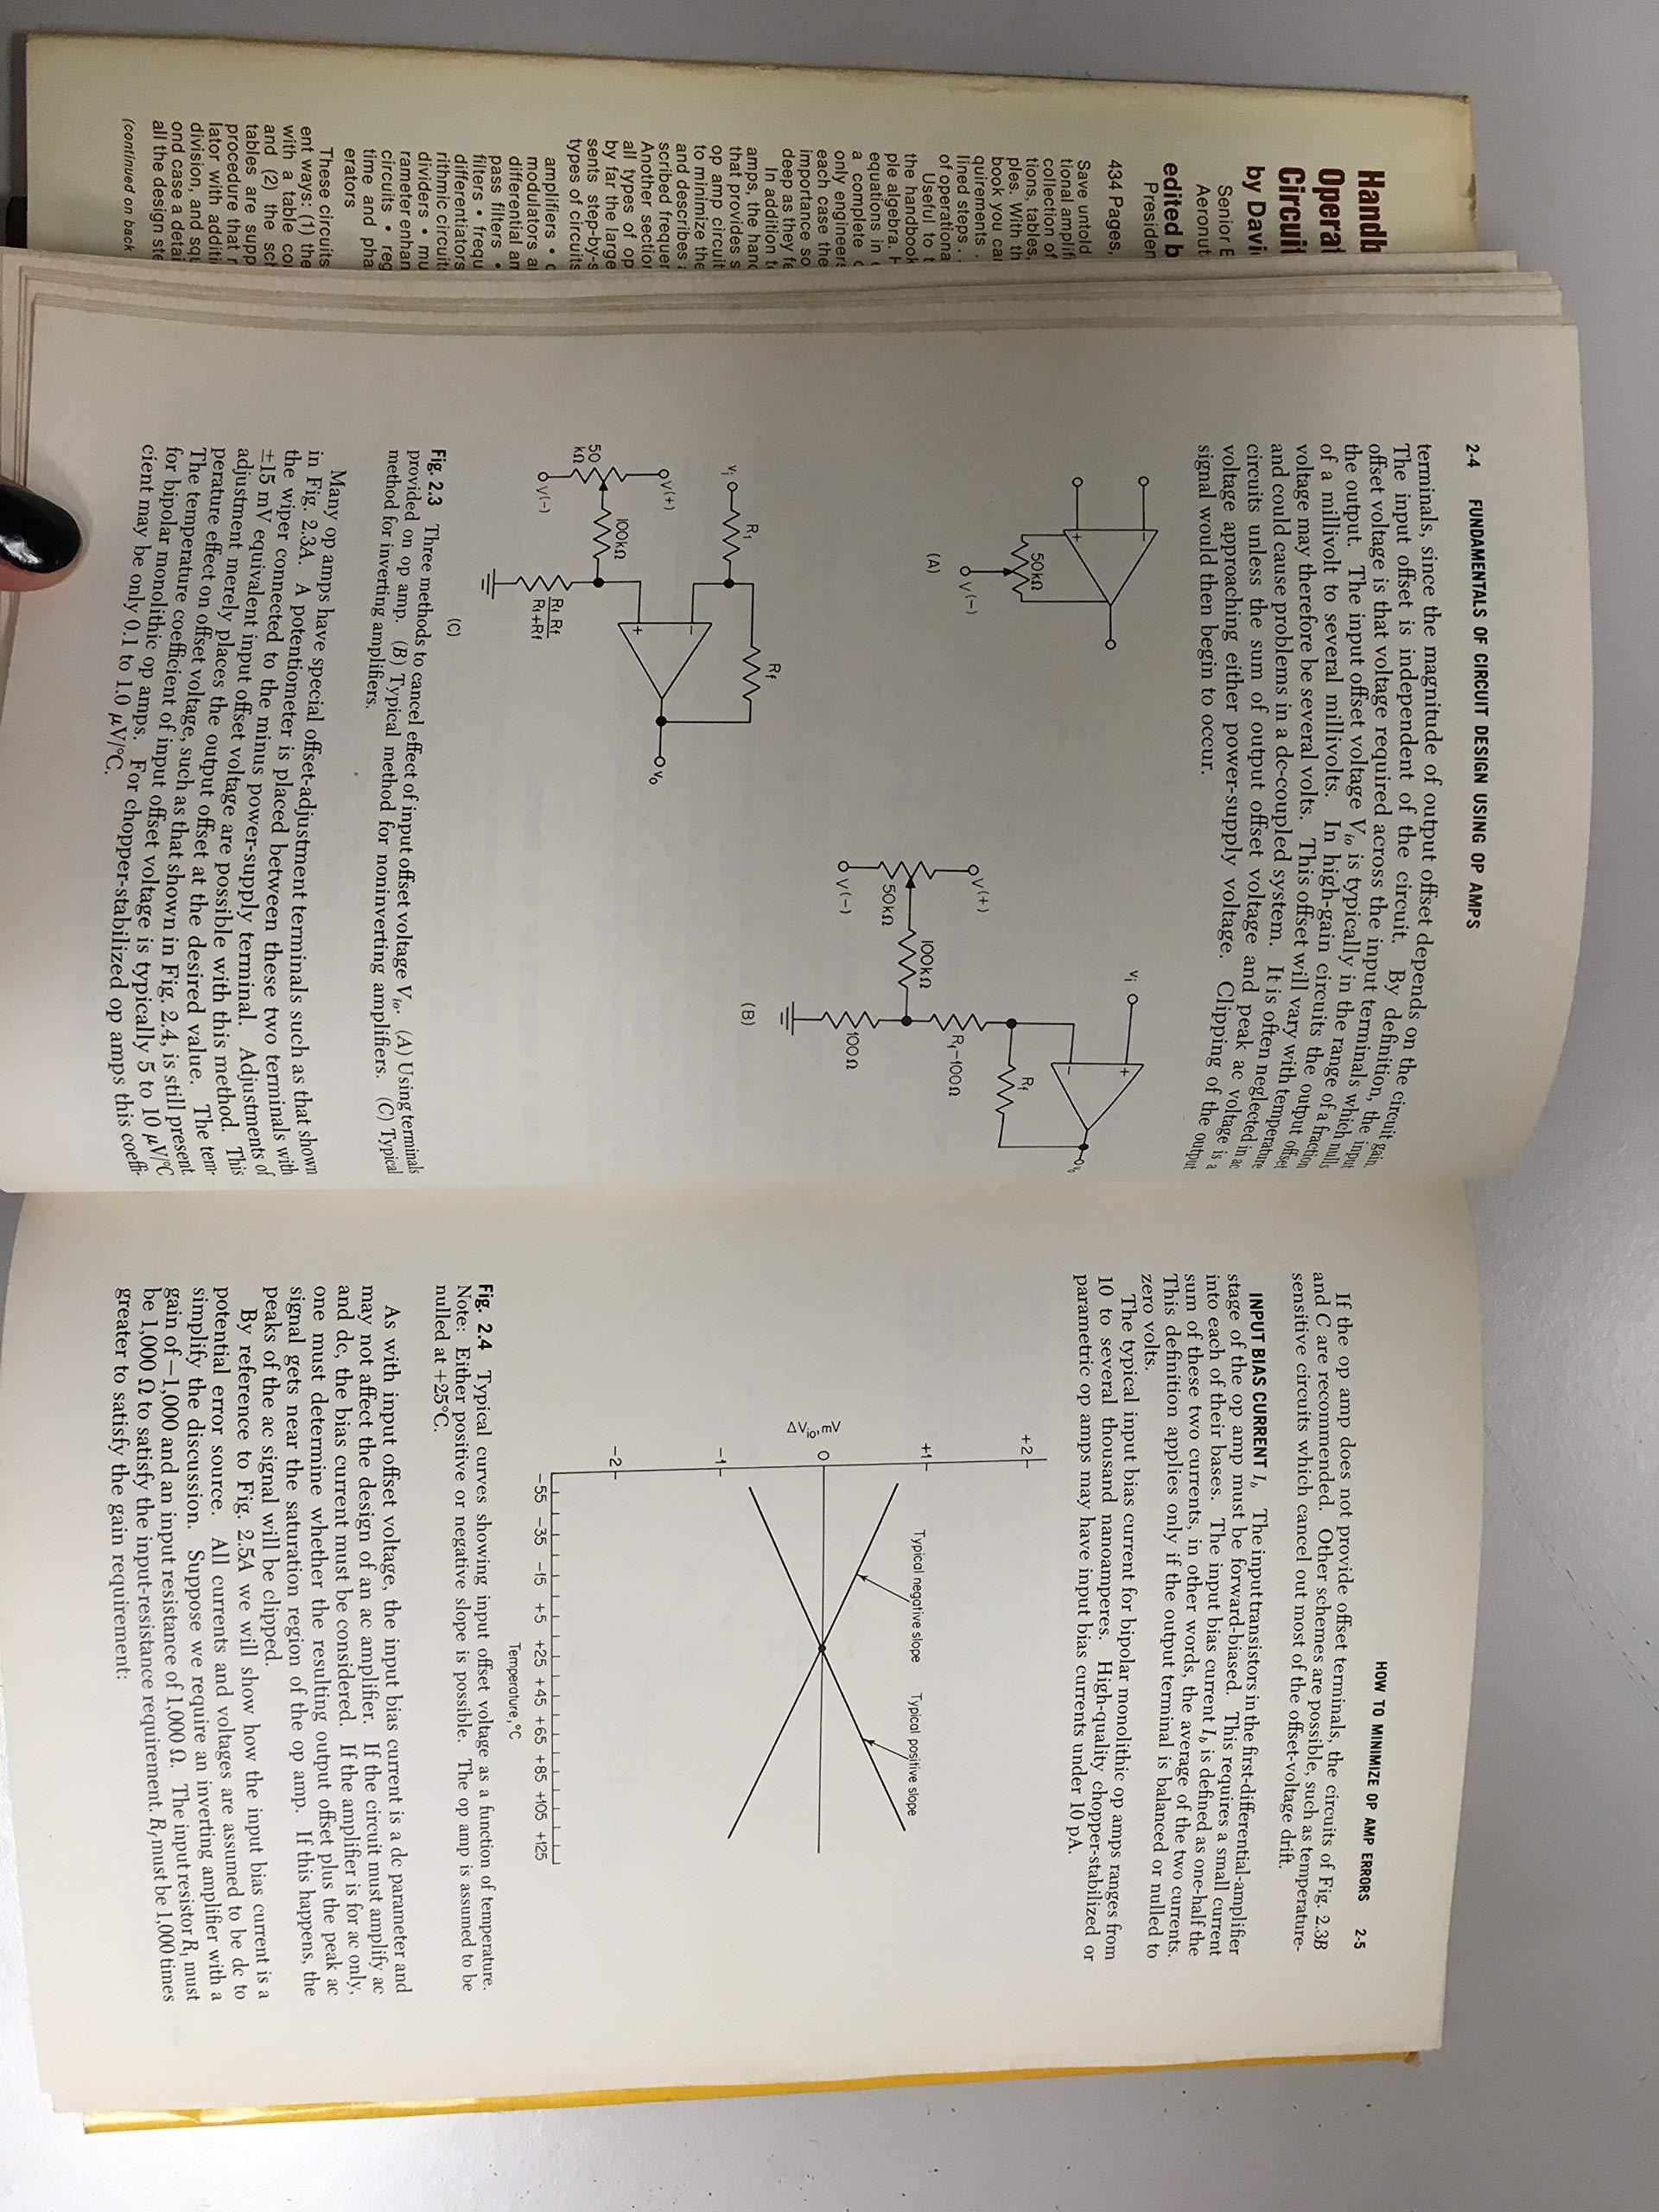 Handbook Of Operational Amplifier Circuit Design David F Stout Basics Electrical Engineering Milton Kaufman 9780070617971 Books